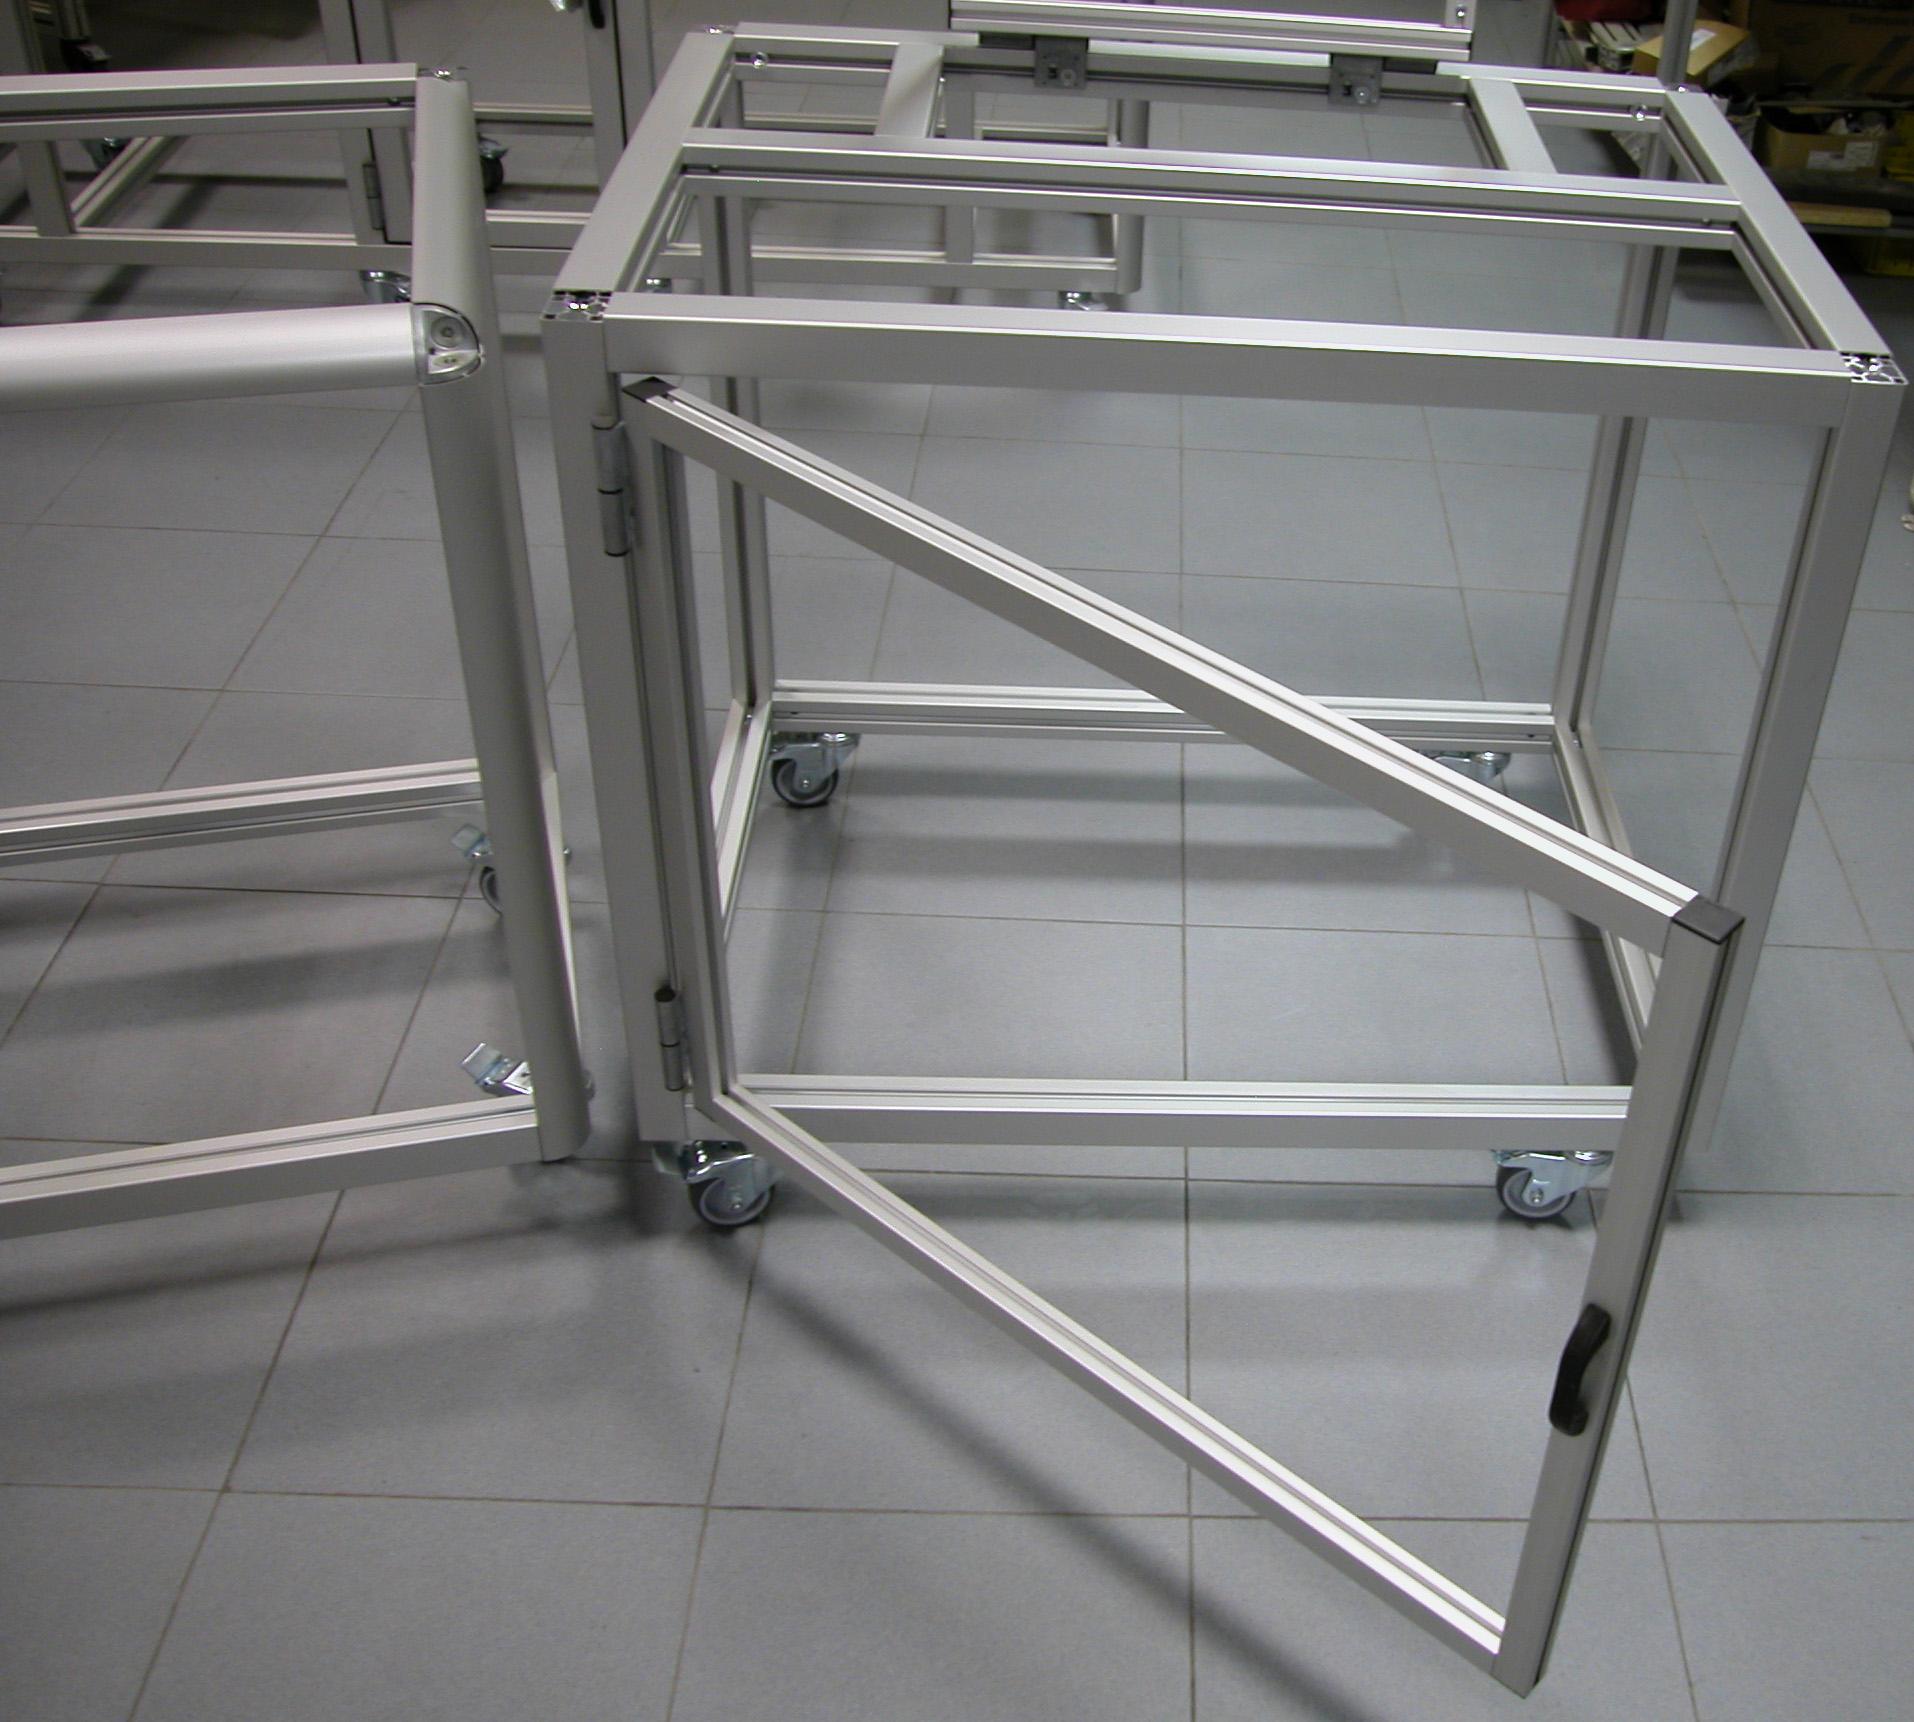 Perfileria de aluminio para armarios materiales de for Perfiles aluminio para muebles